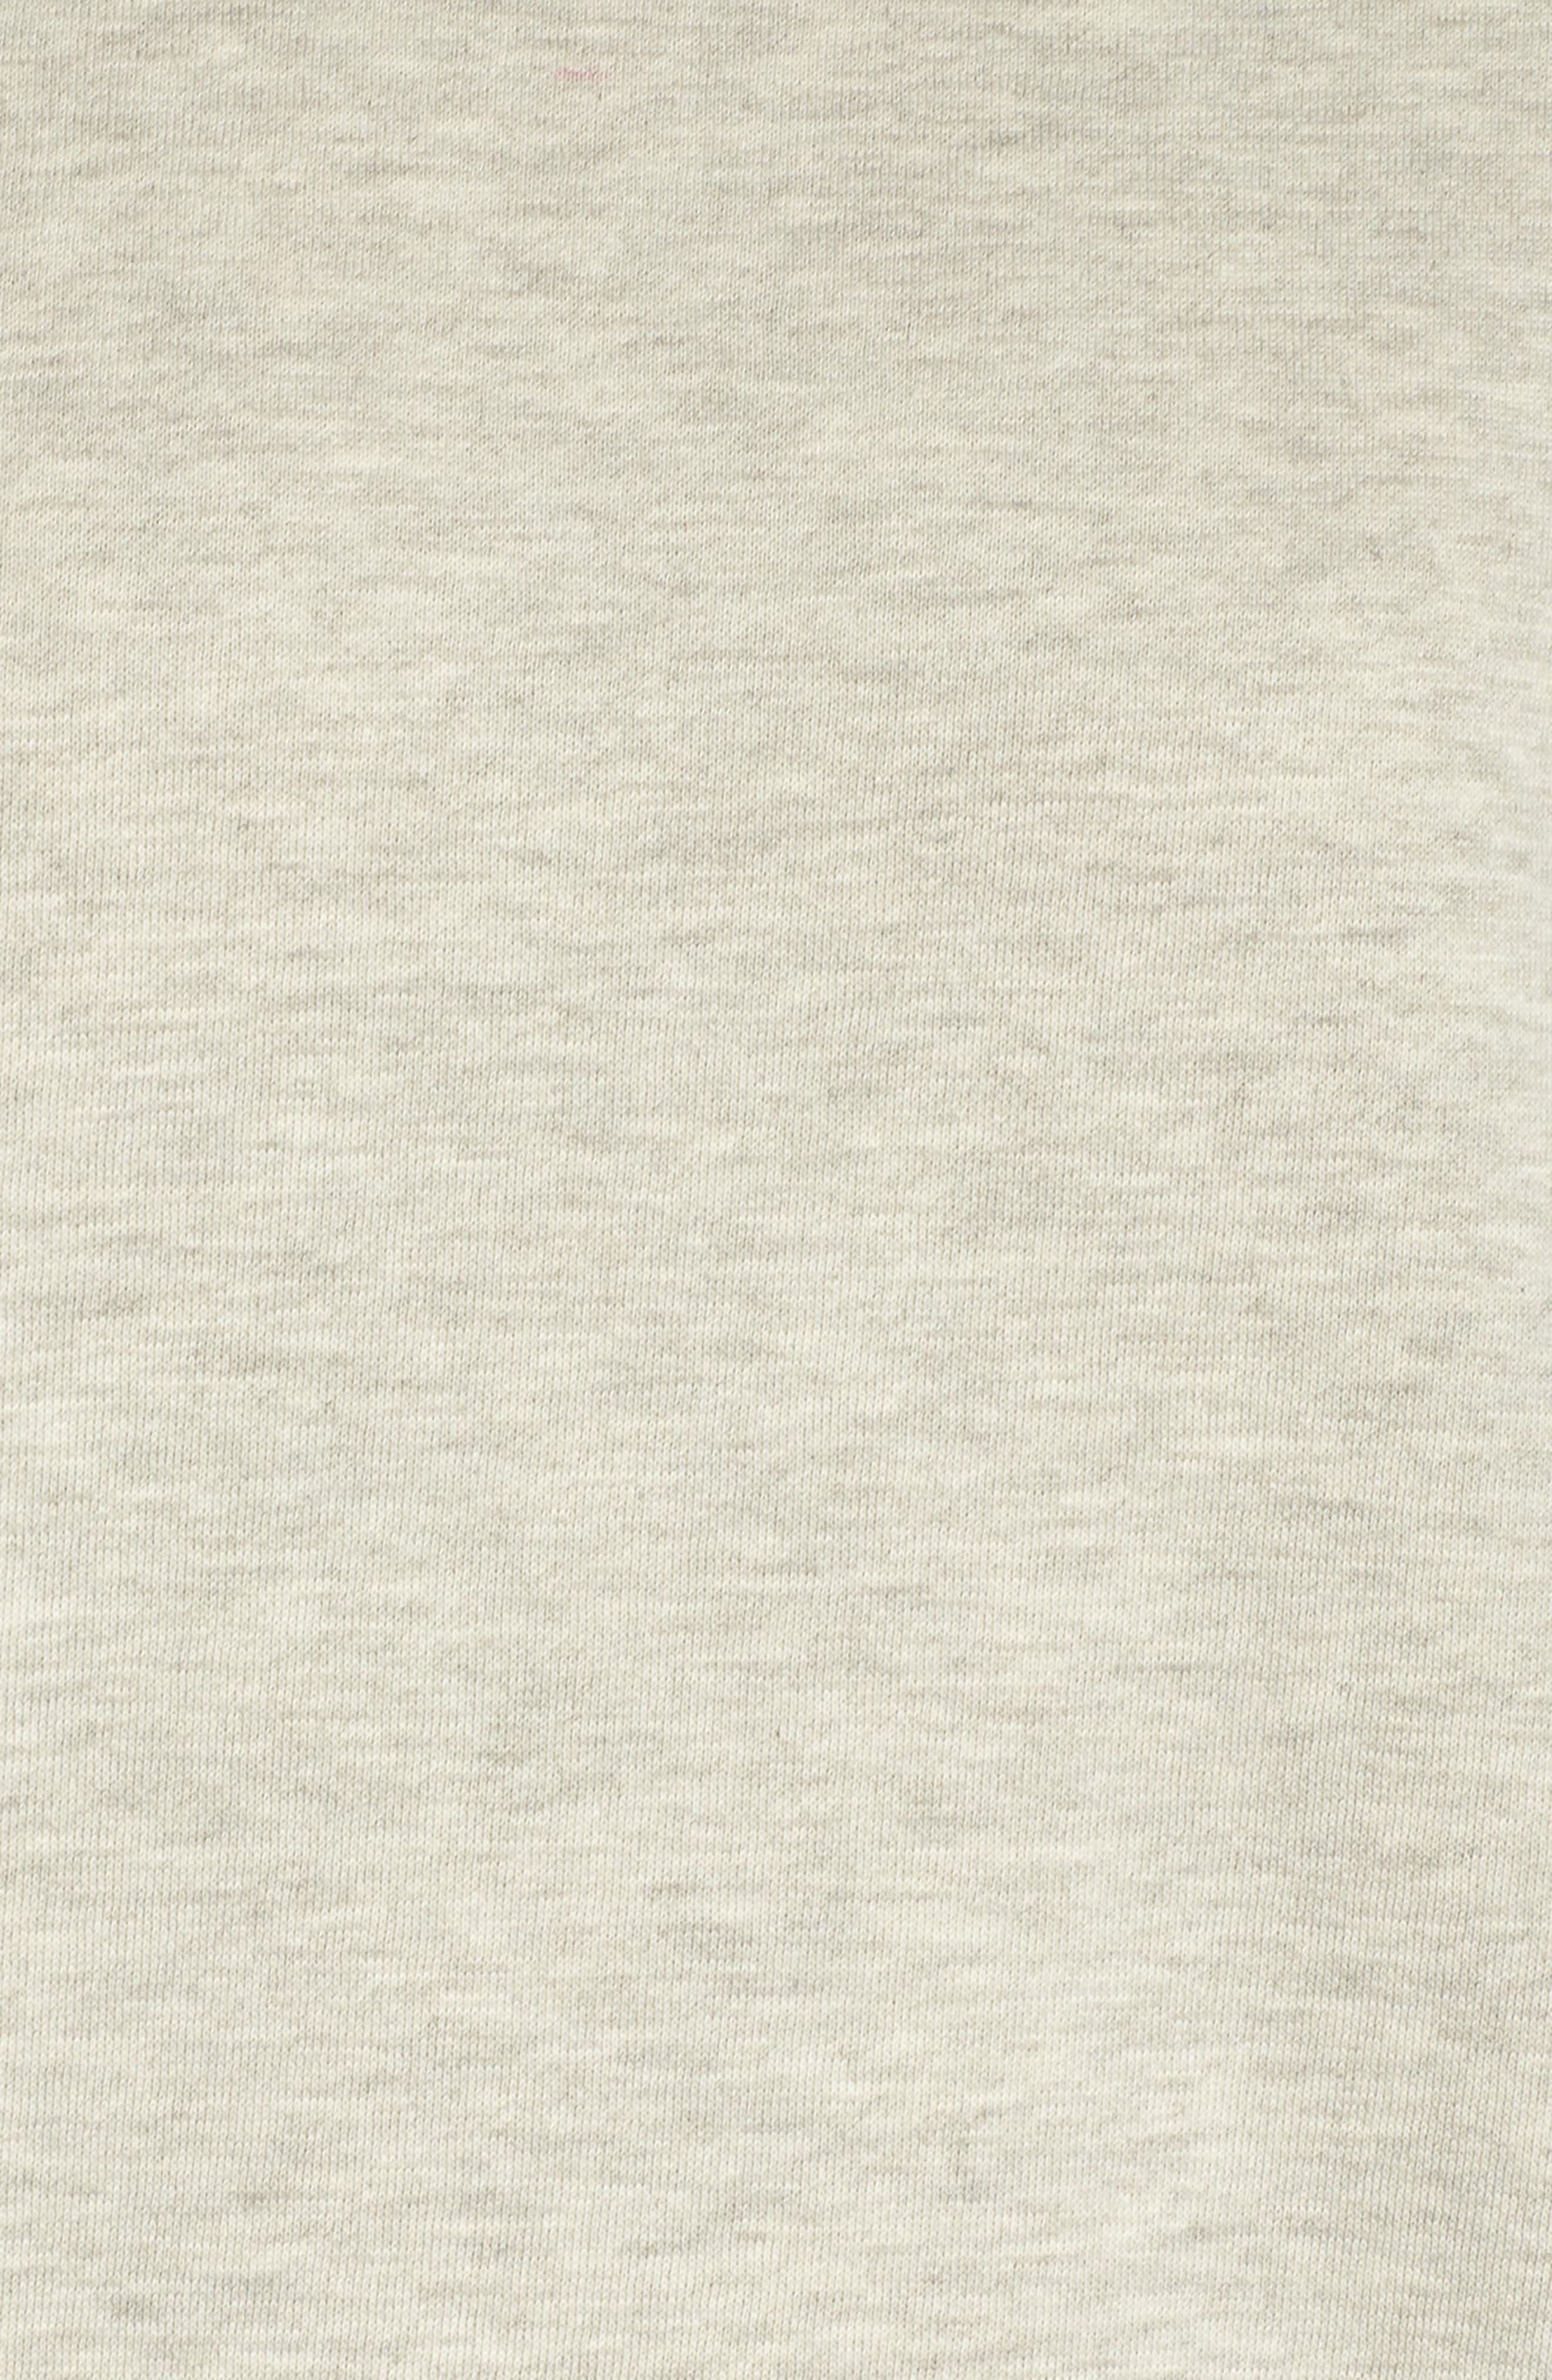 Lounge Sweatshirt Dress,                             Alternate thumbnail 3, color,                             Pebble Heather / Mauve